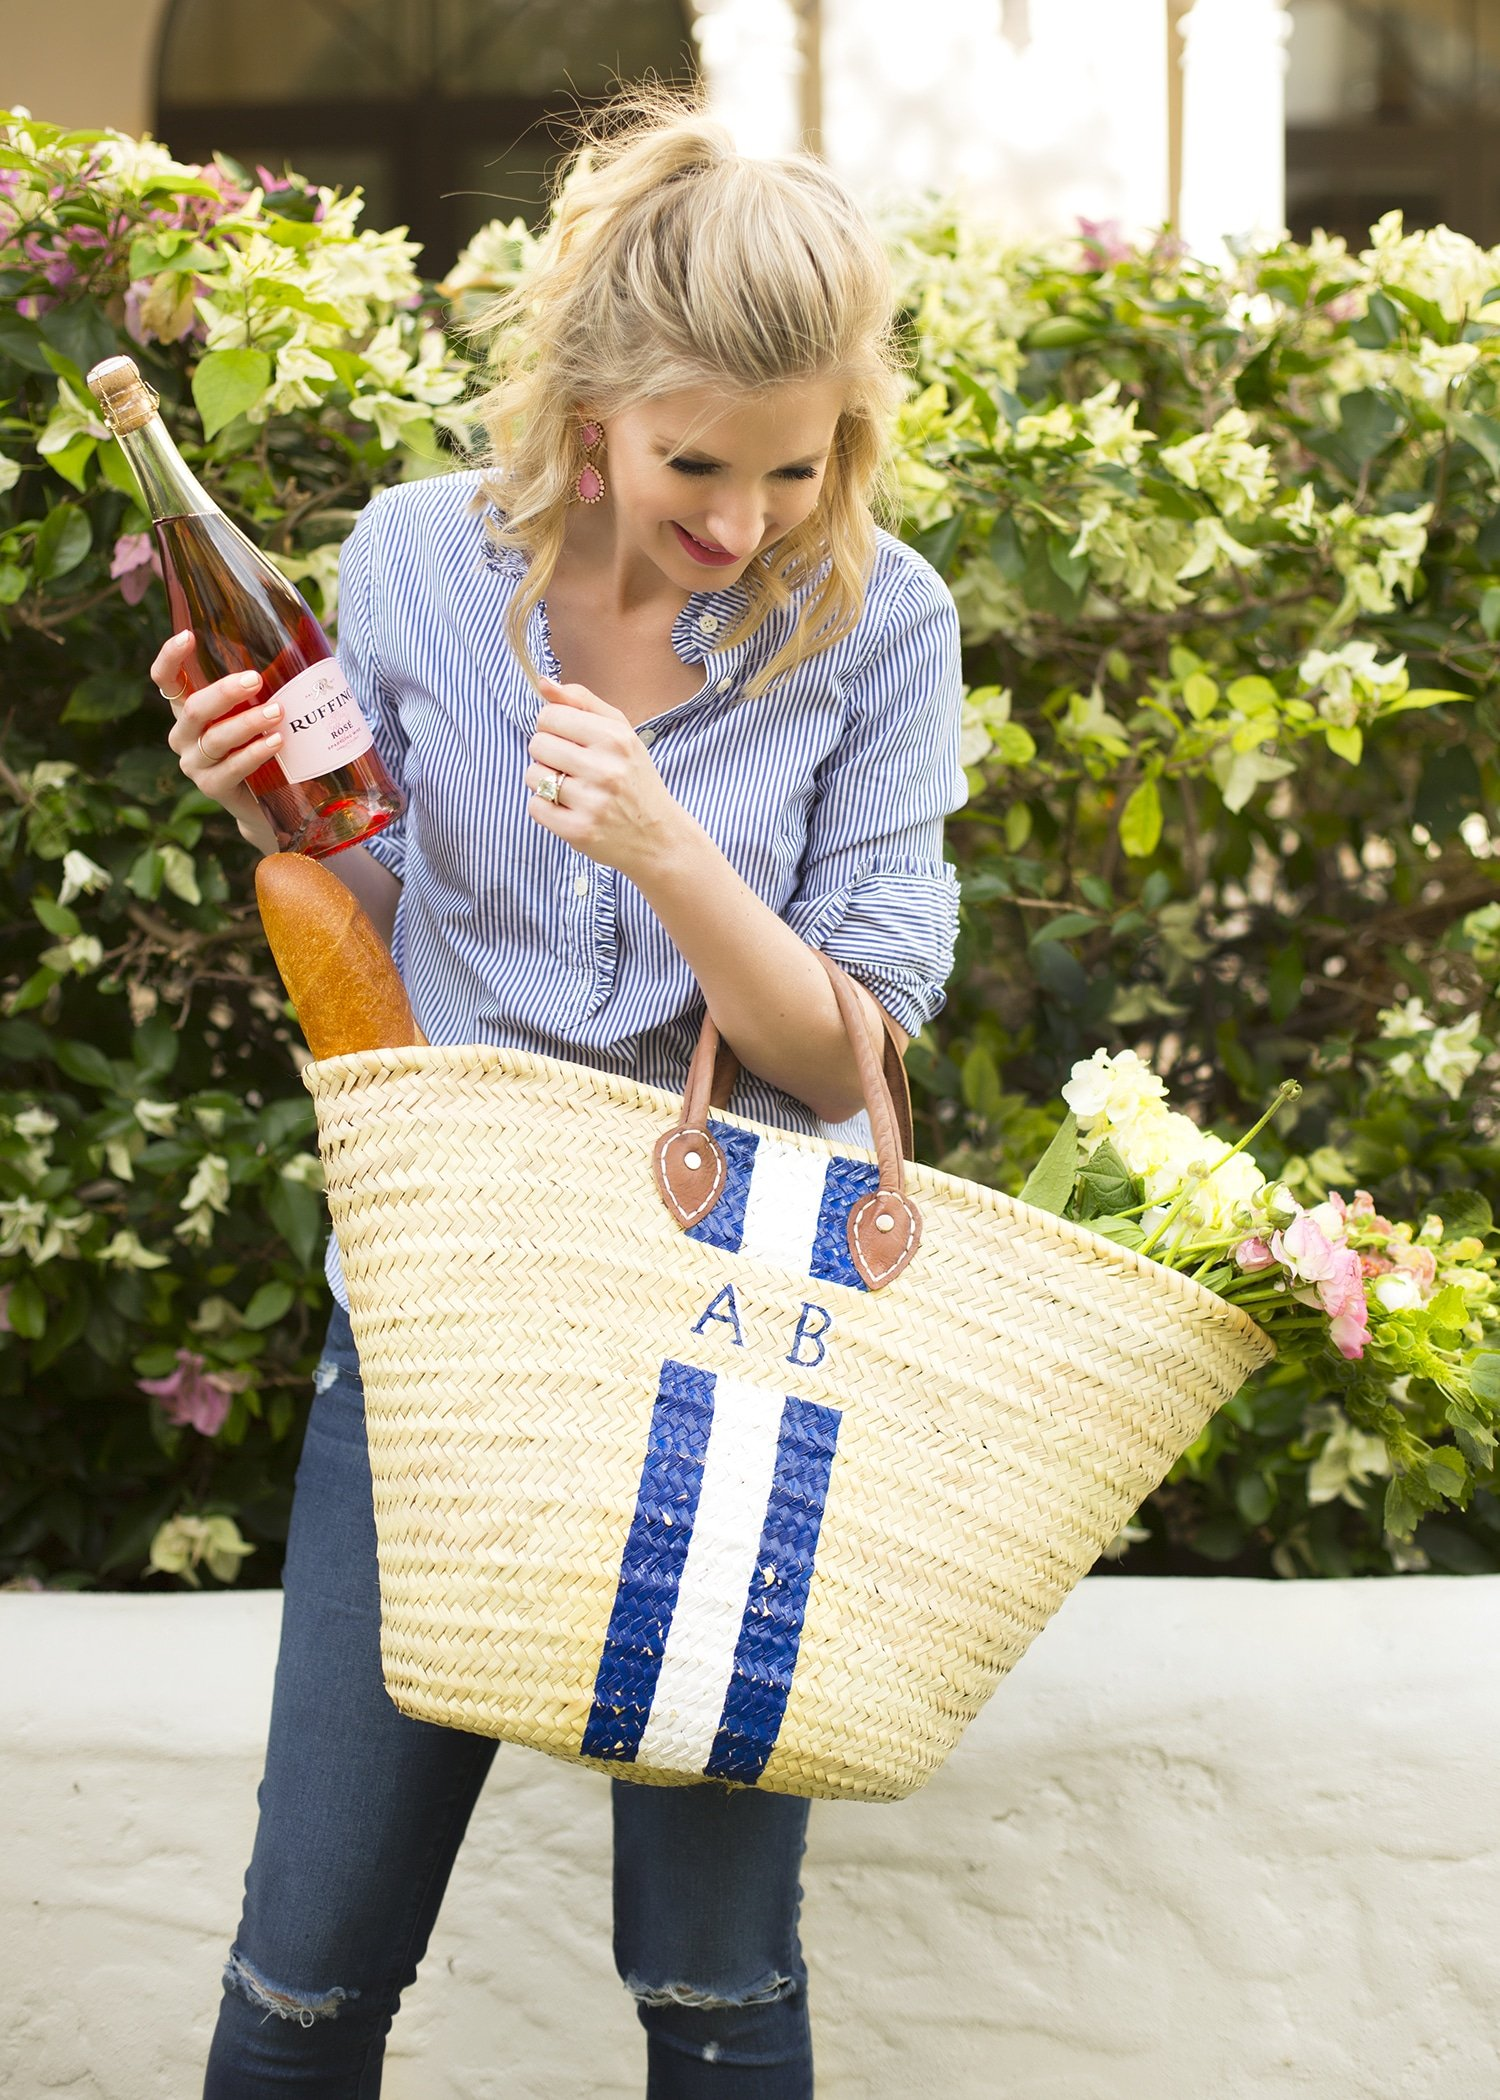 Blogger Ashley Brooke wearing a Lindroth Design Island Bag | ashleybrookedesigns.com